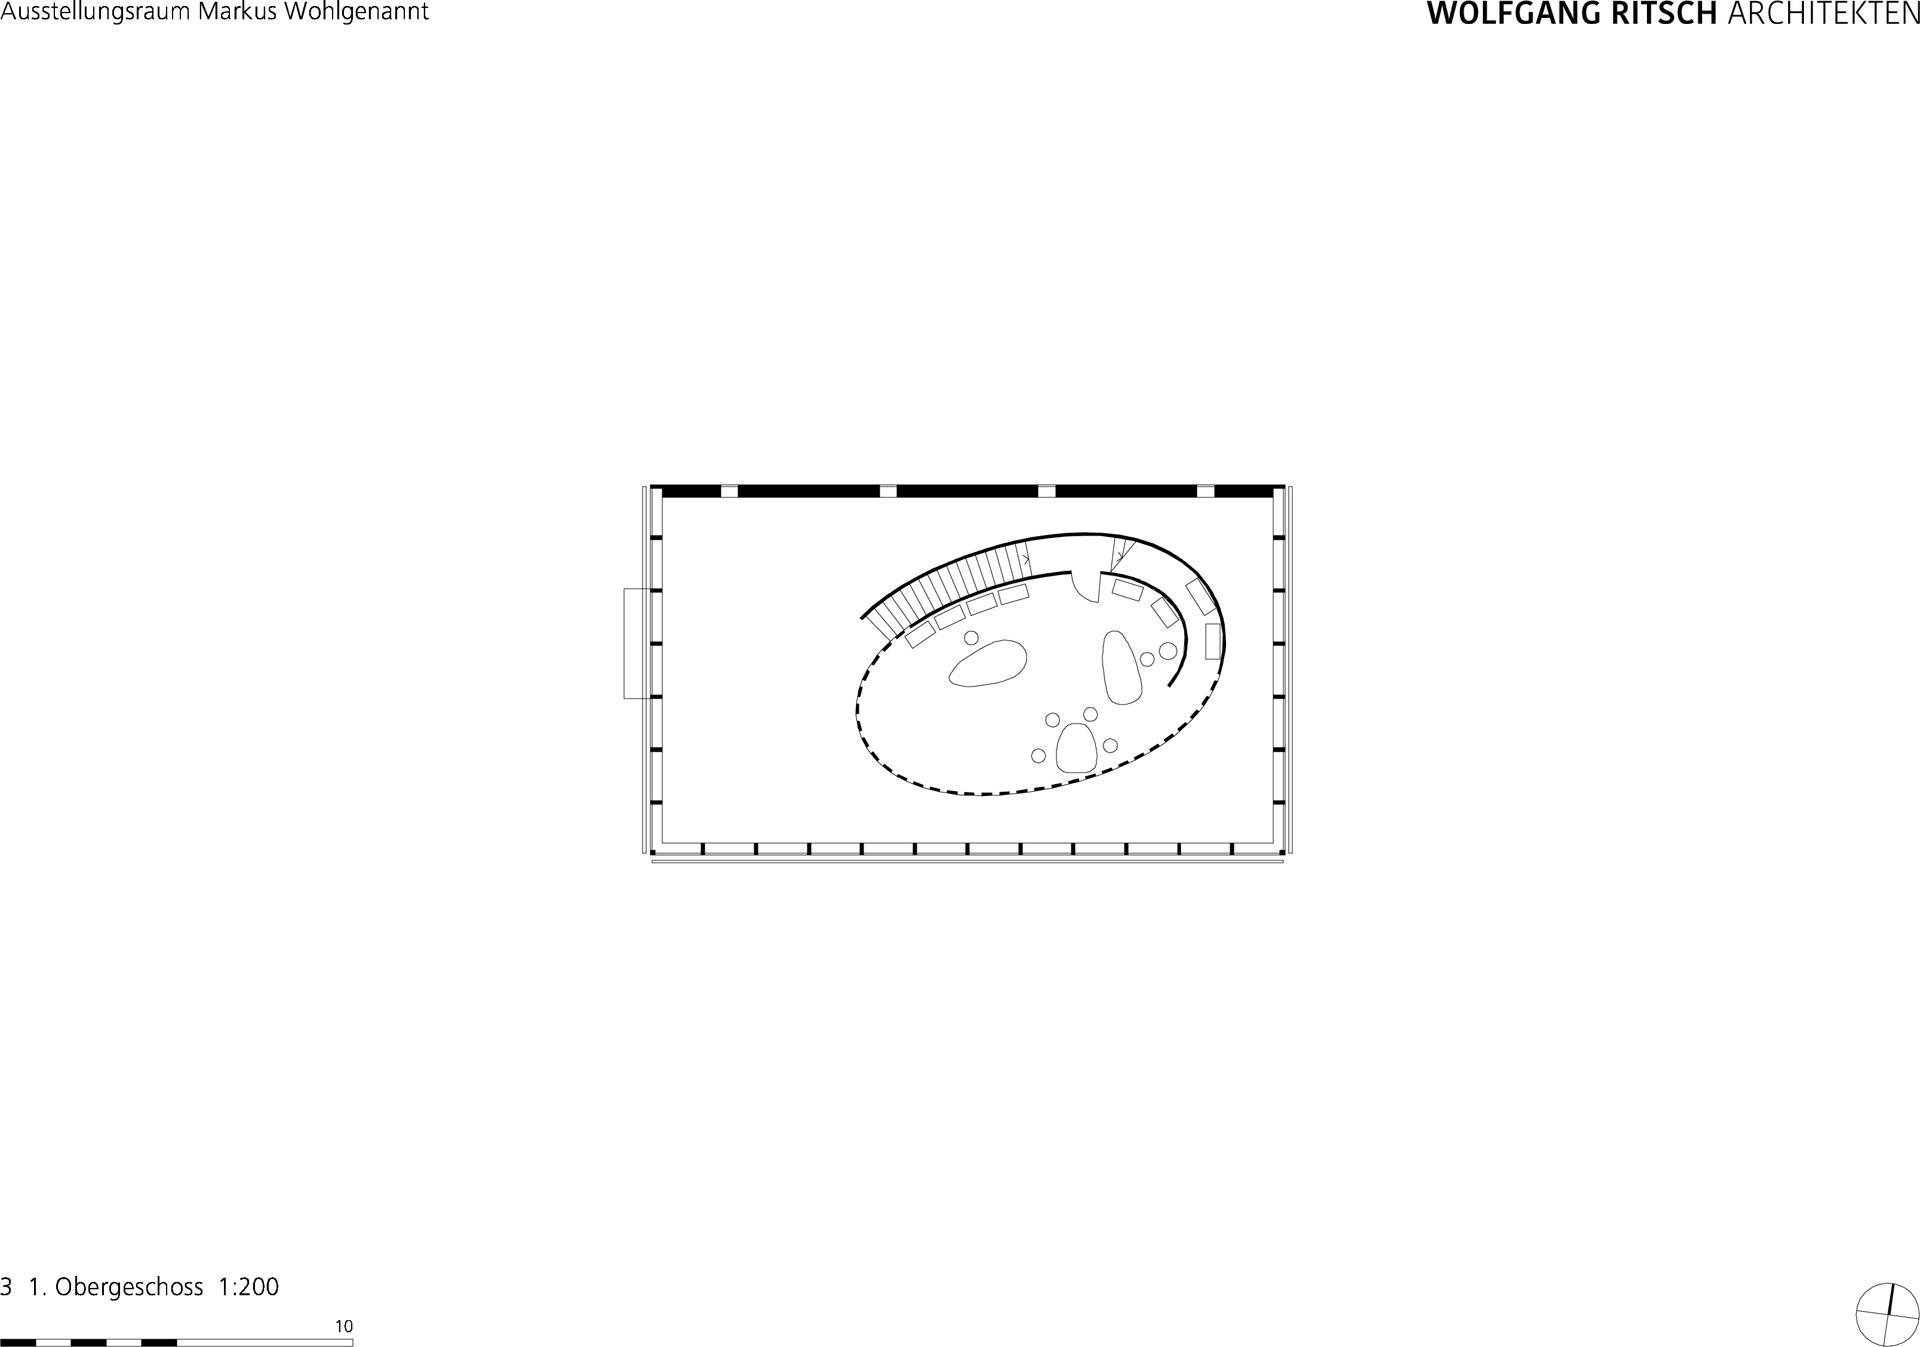 X:PROJEKTE70003980 Wohlgenannt2-PUBLIPLAN20-dwg903_1og 200